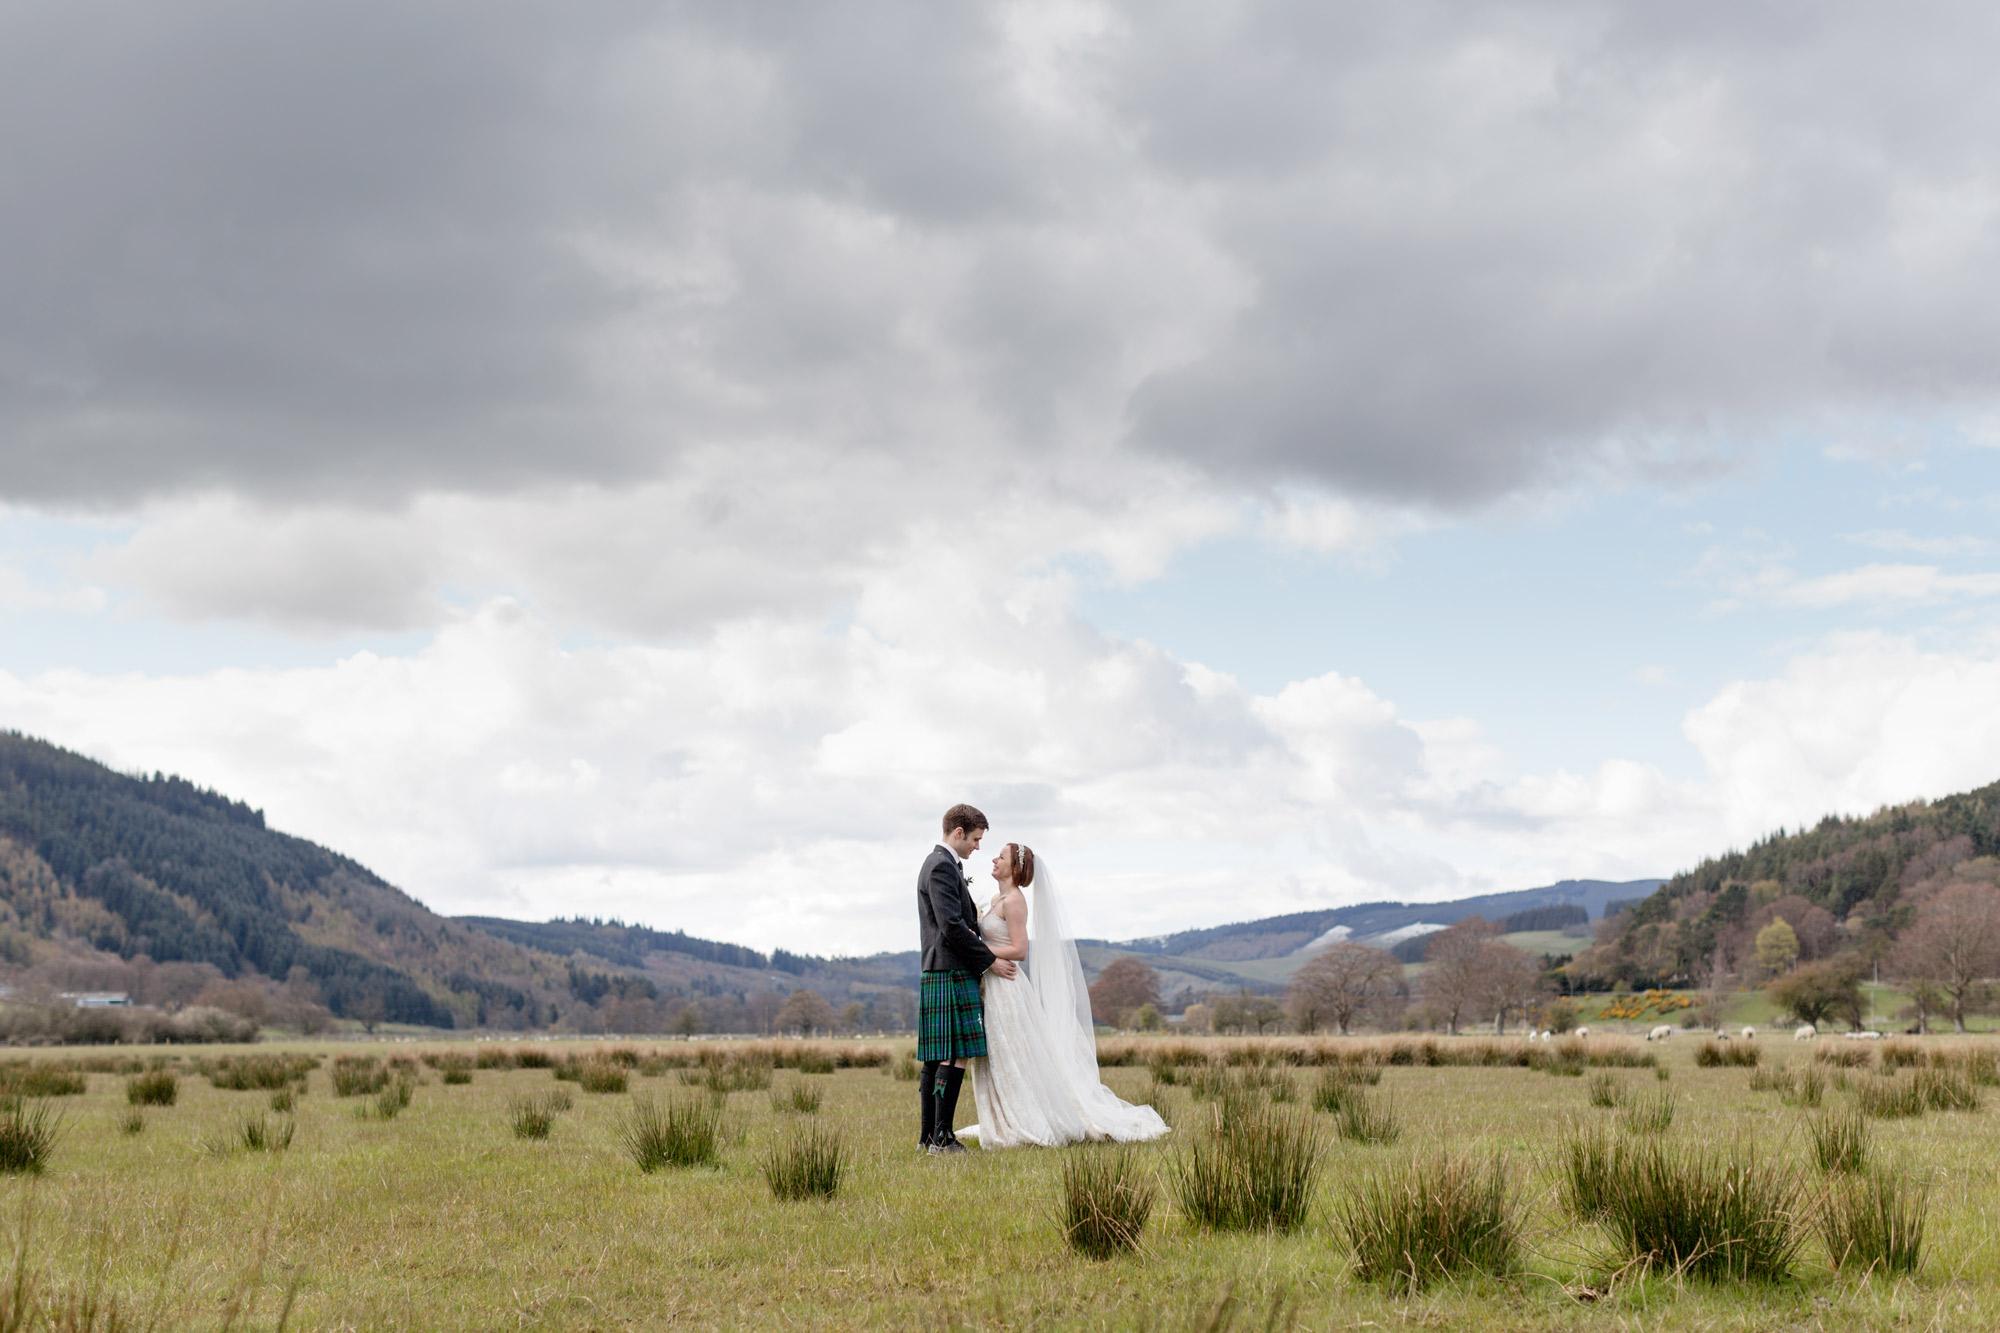 wedding in innerleithen scottish borders